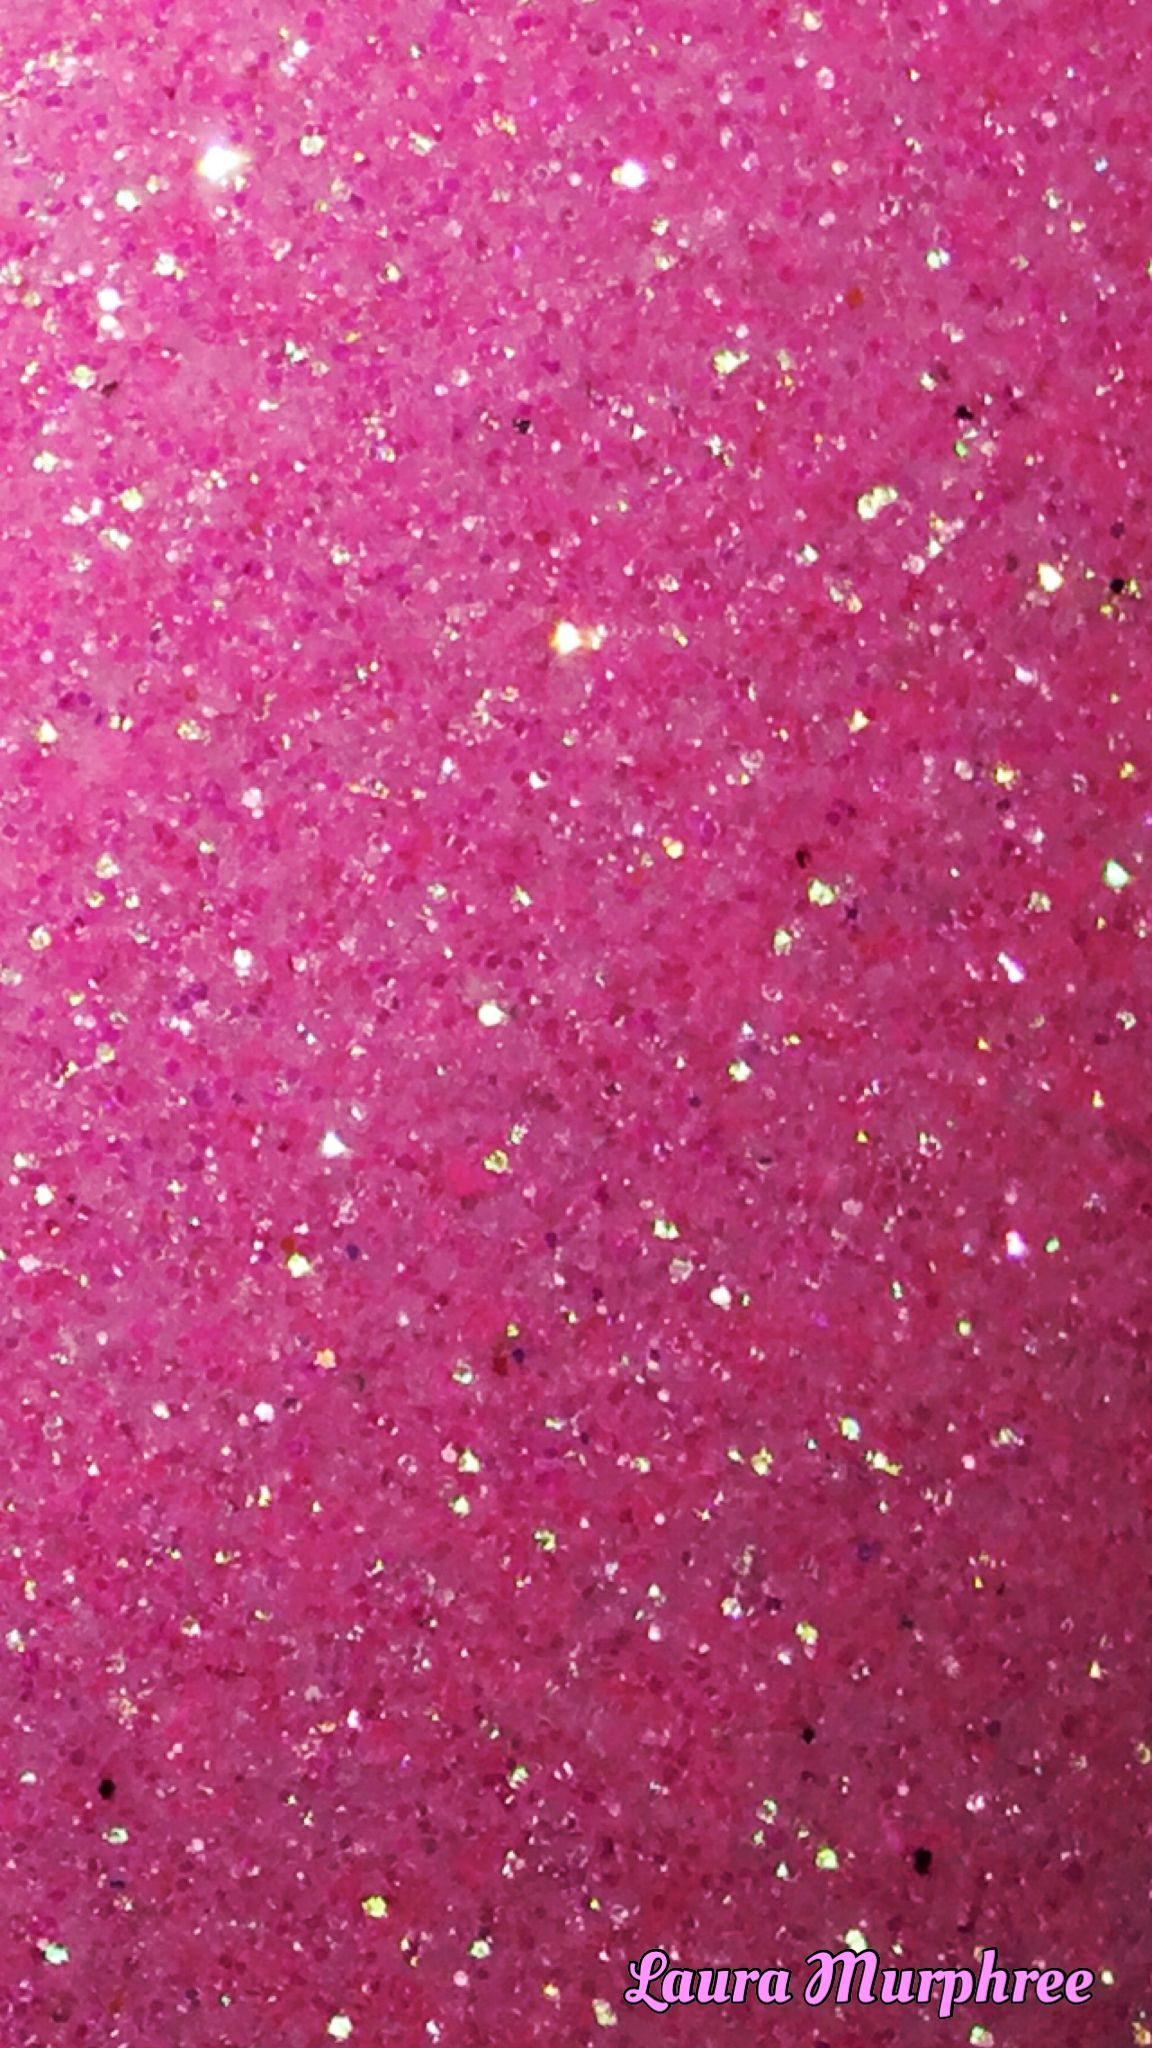 Download Premium Image Of Pink Sparkles Bokeh Background Invitation Card Pink Sparkle Background Sparkles Background Pink Sparkles